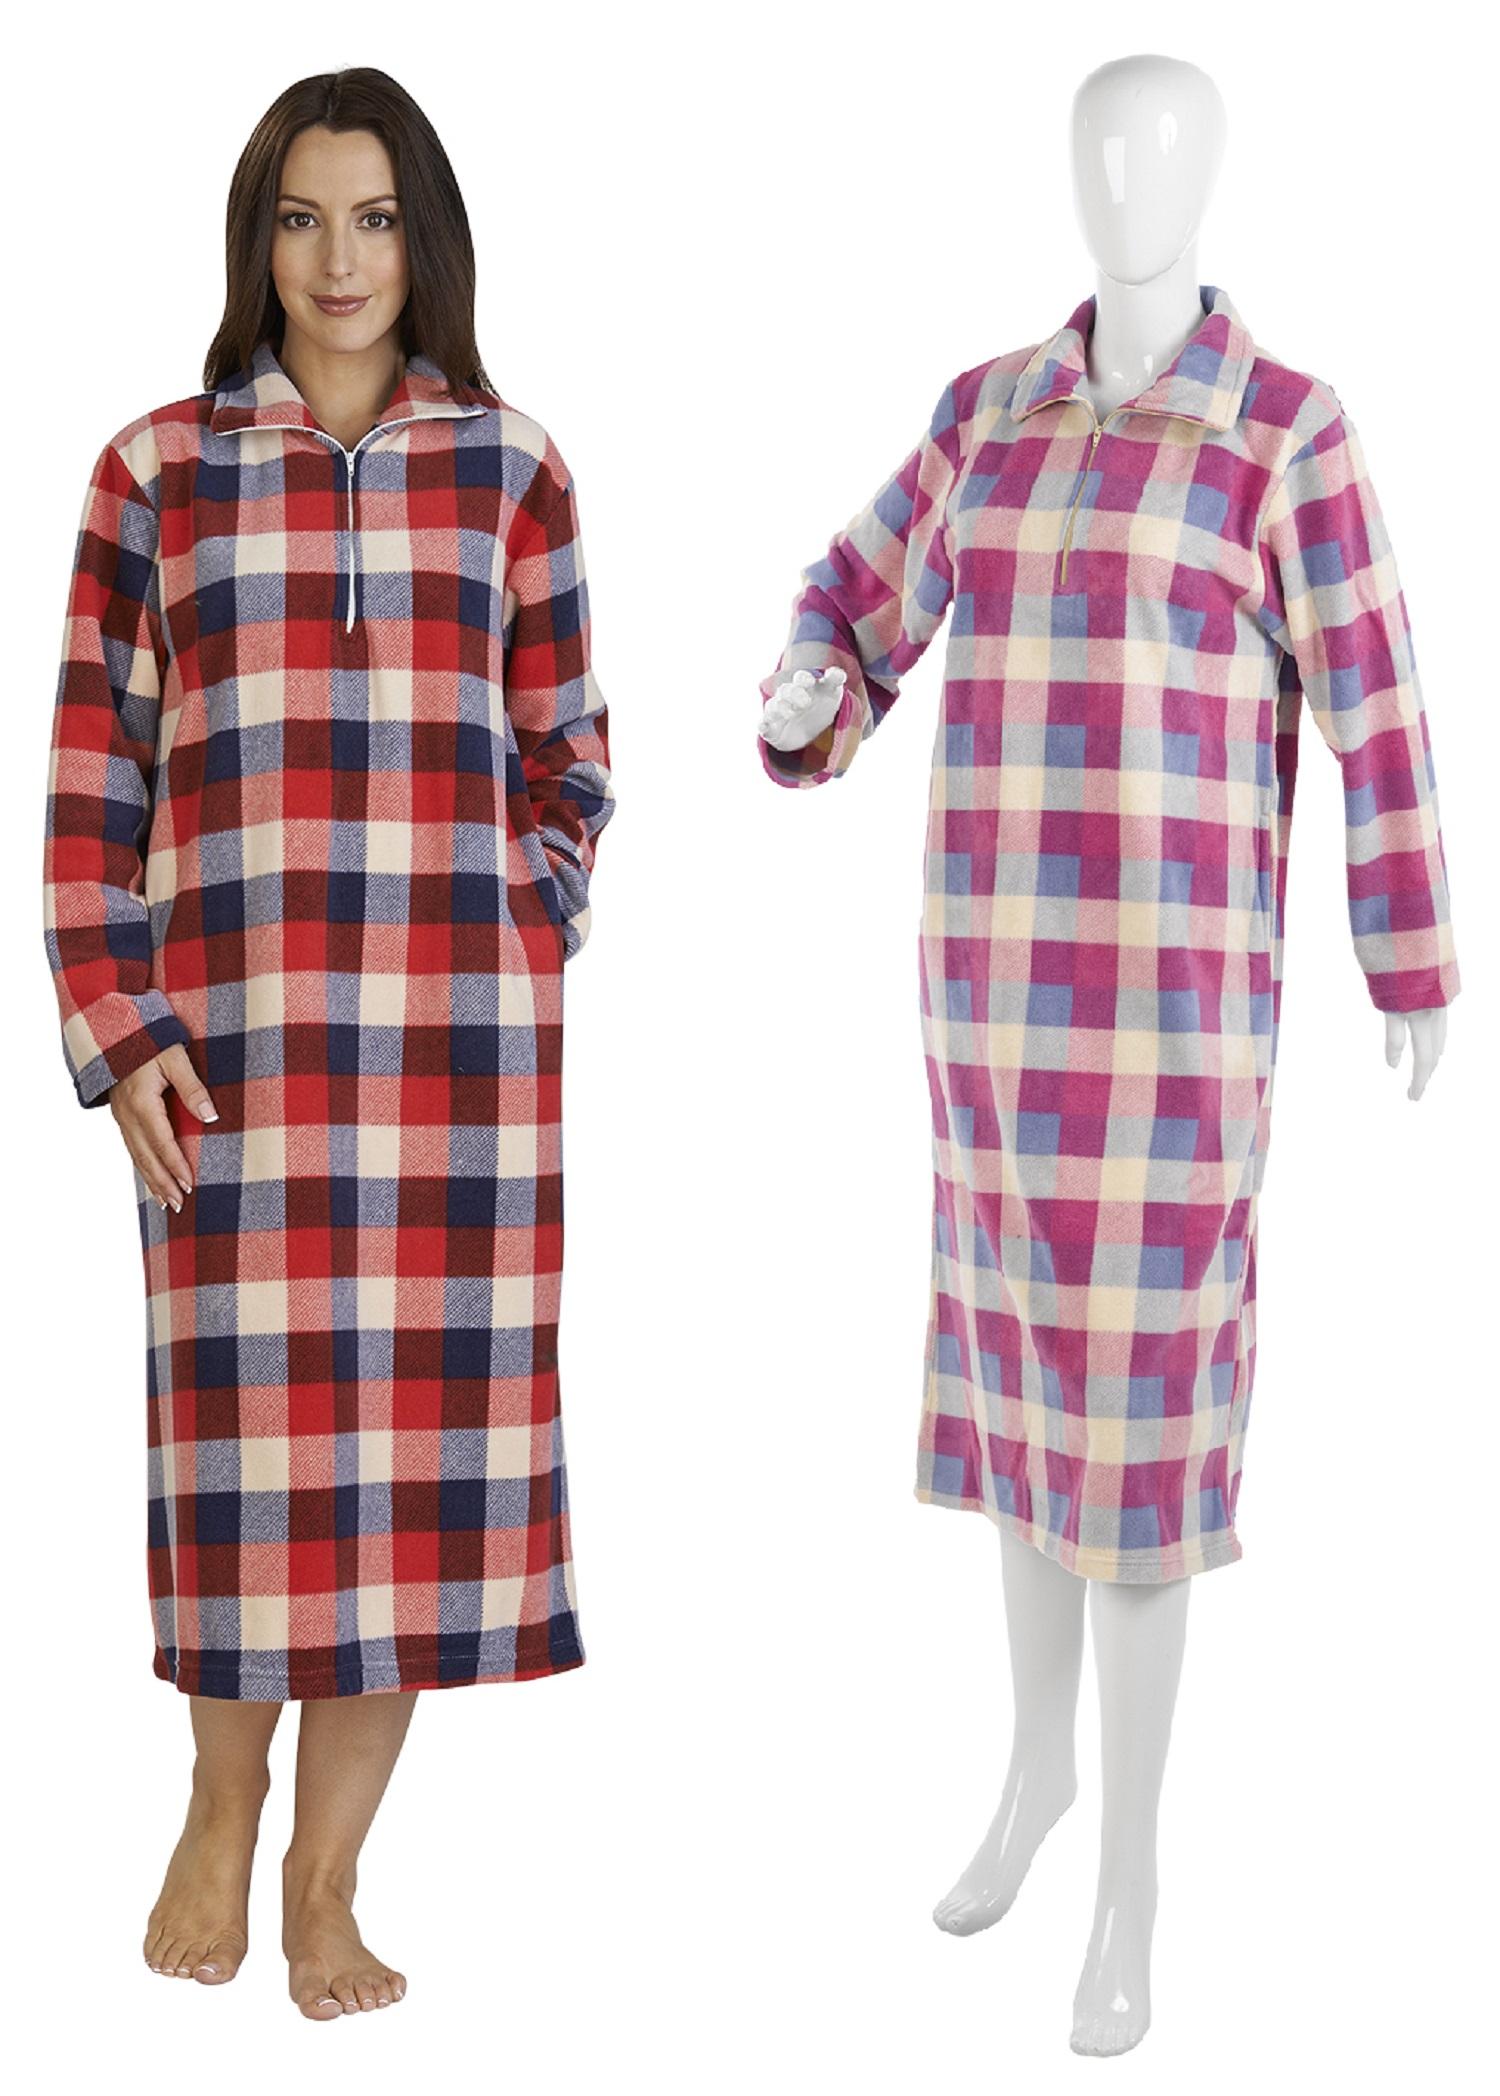 8c26b4990e Womens Slenderella Checked Micro Fleece Nightdress Long Sleeved Check  Nightie